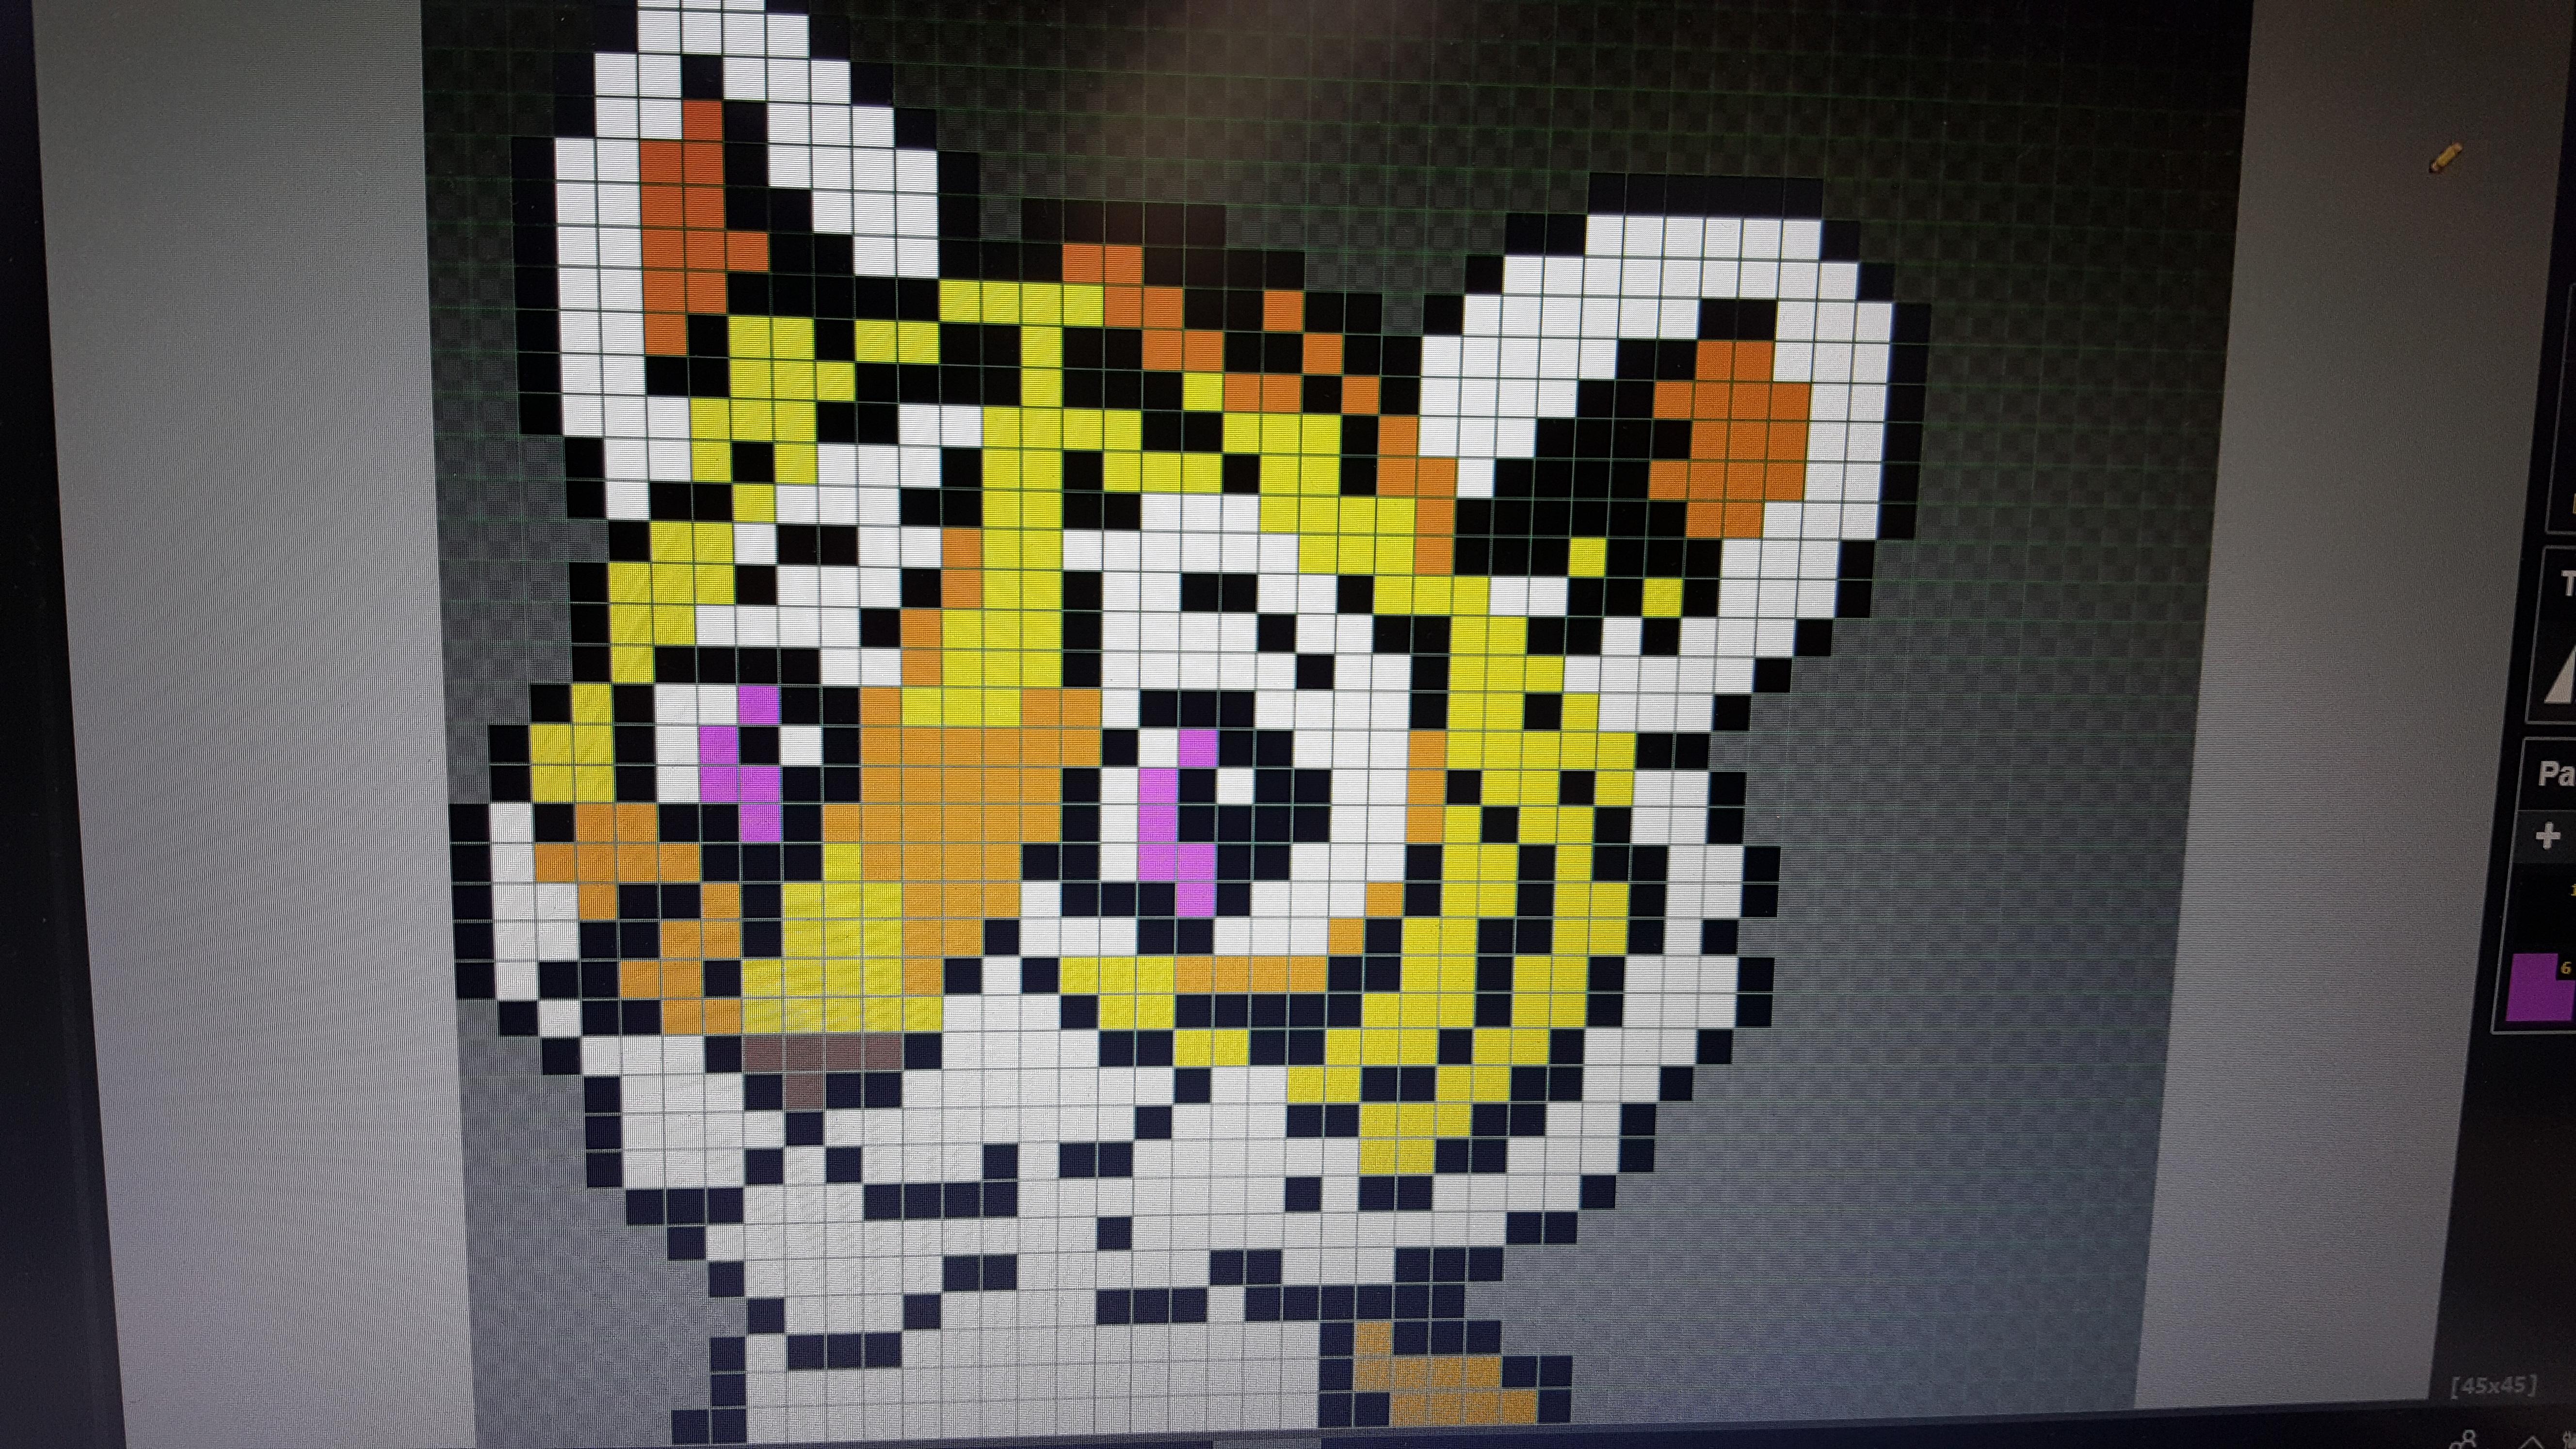 Ateliers hebdos 10-12 Tigre pixel art